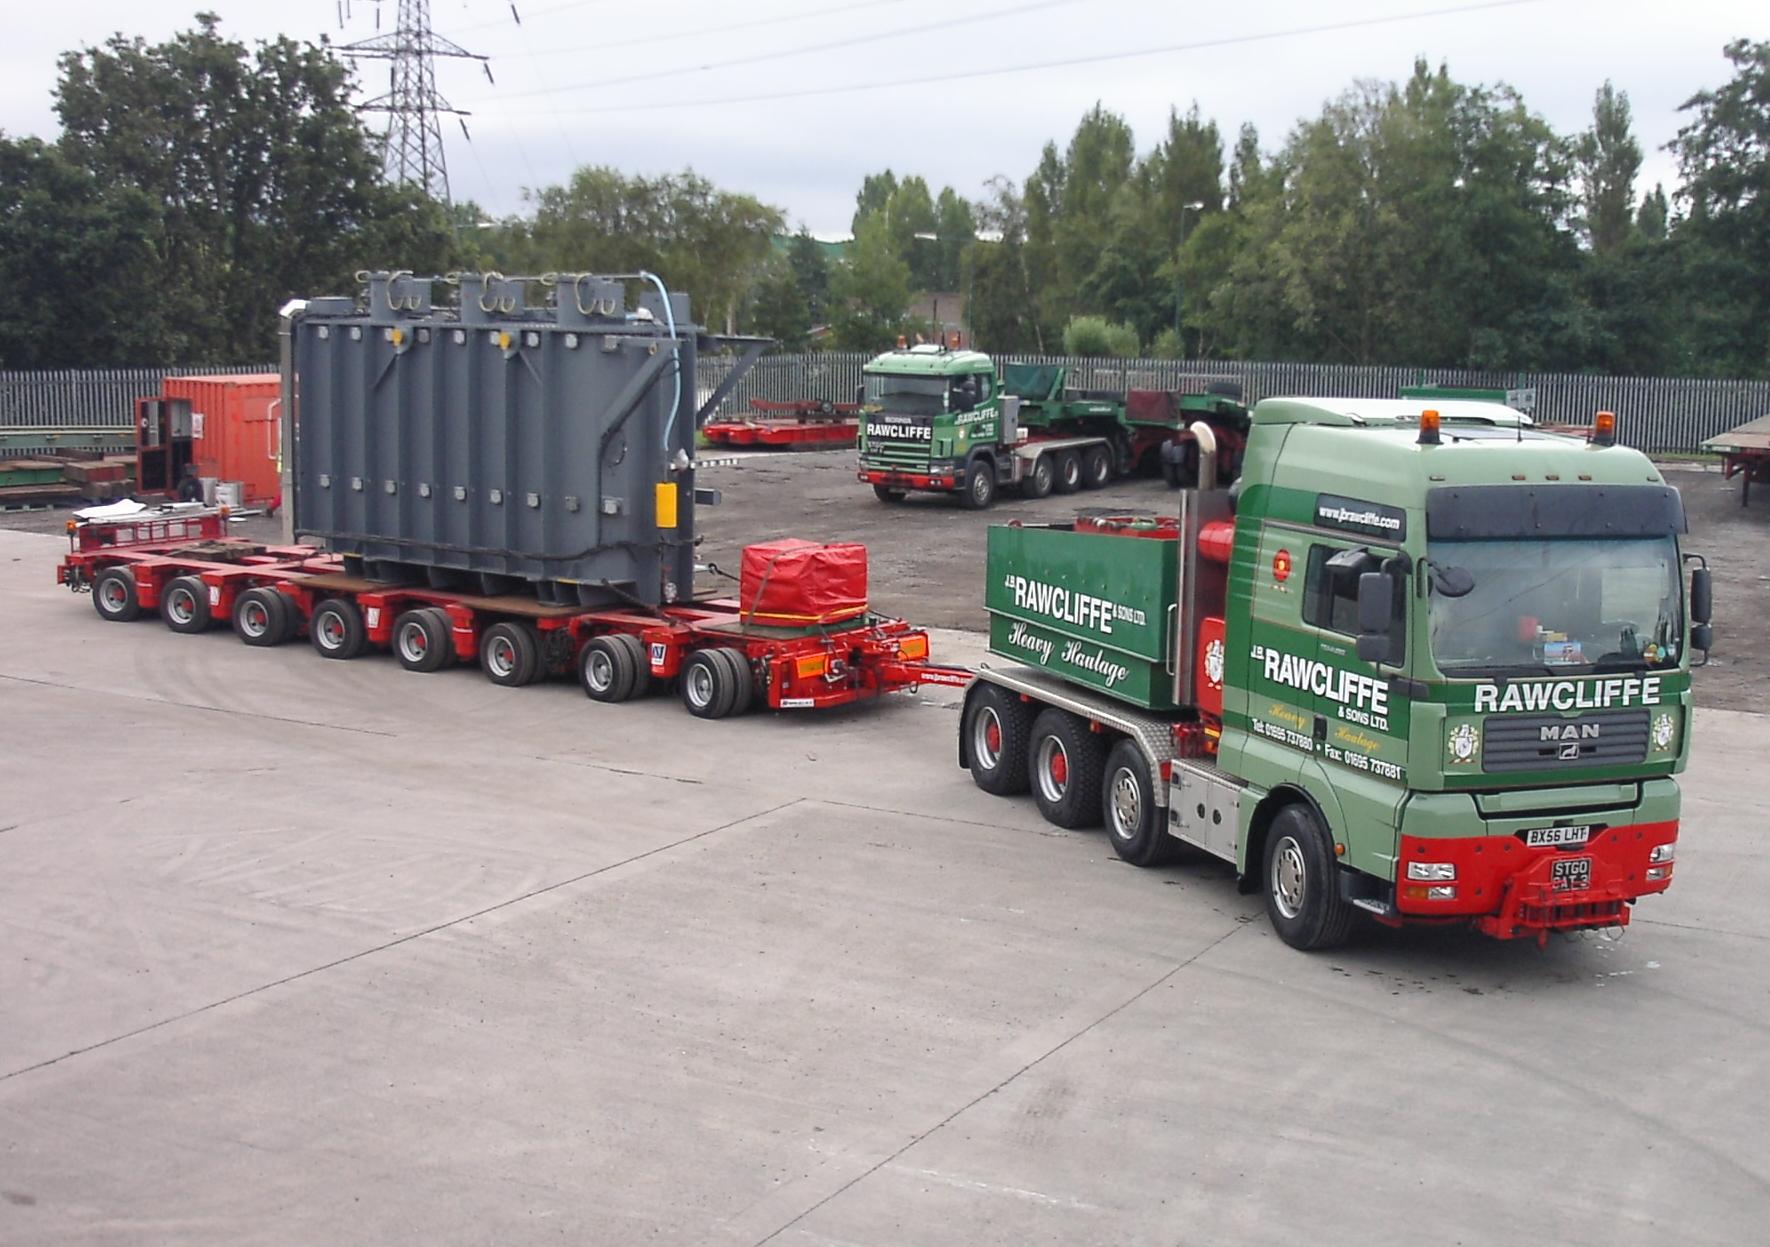 File Rawcliffe Ballast Tractor Amp Trannsformer Jpg